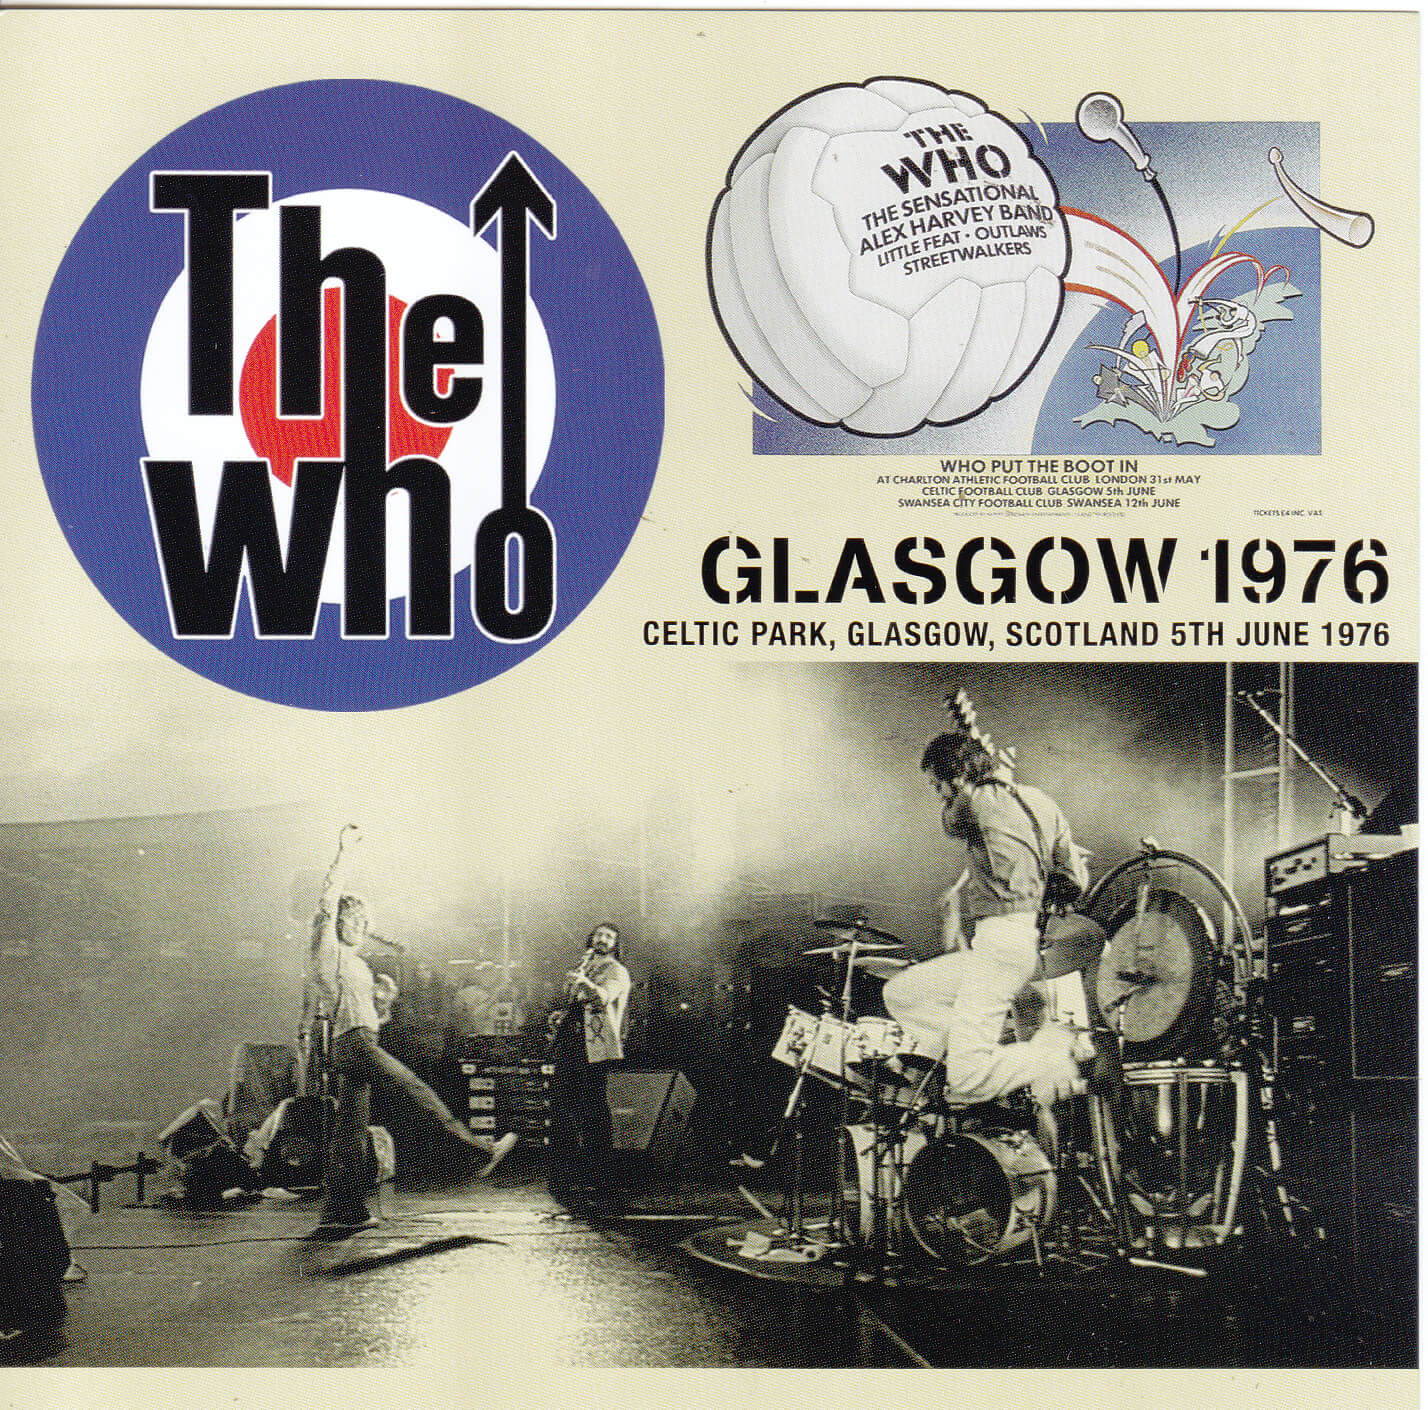 who-76glasgow-non-label1.jpg